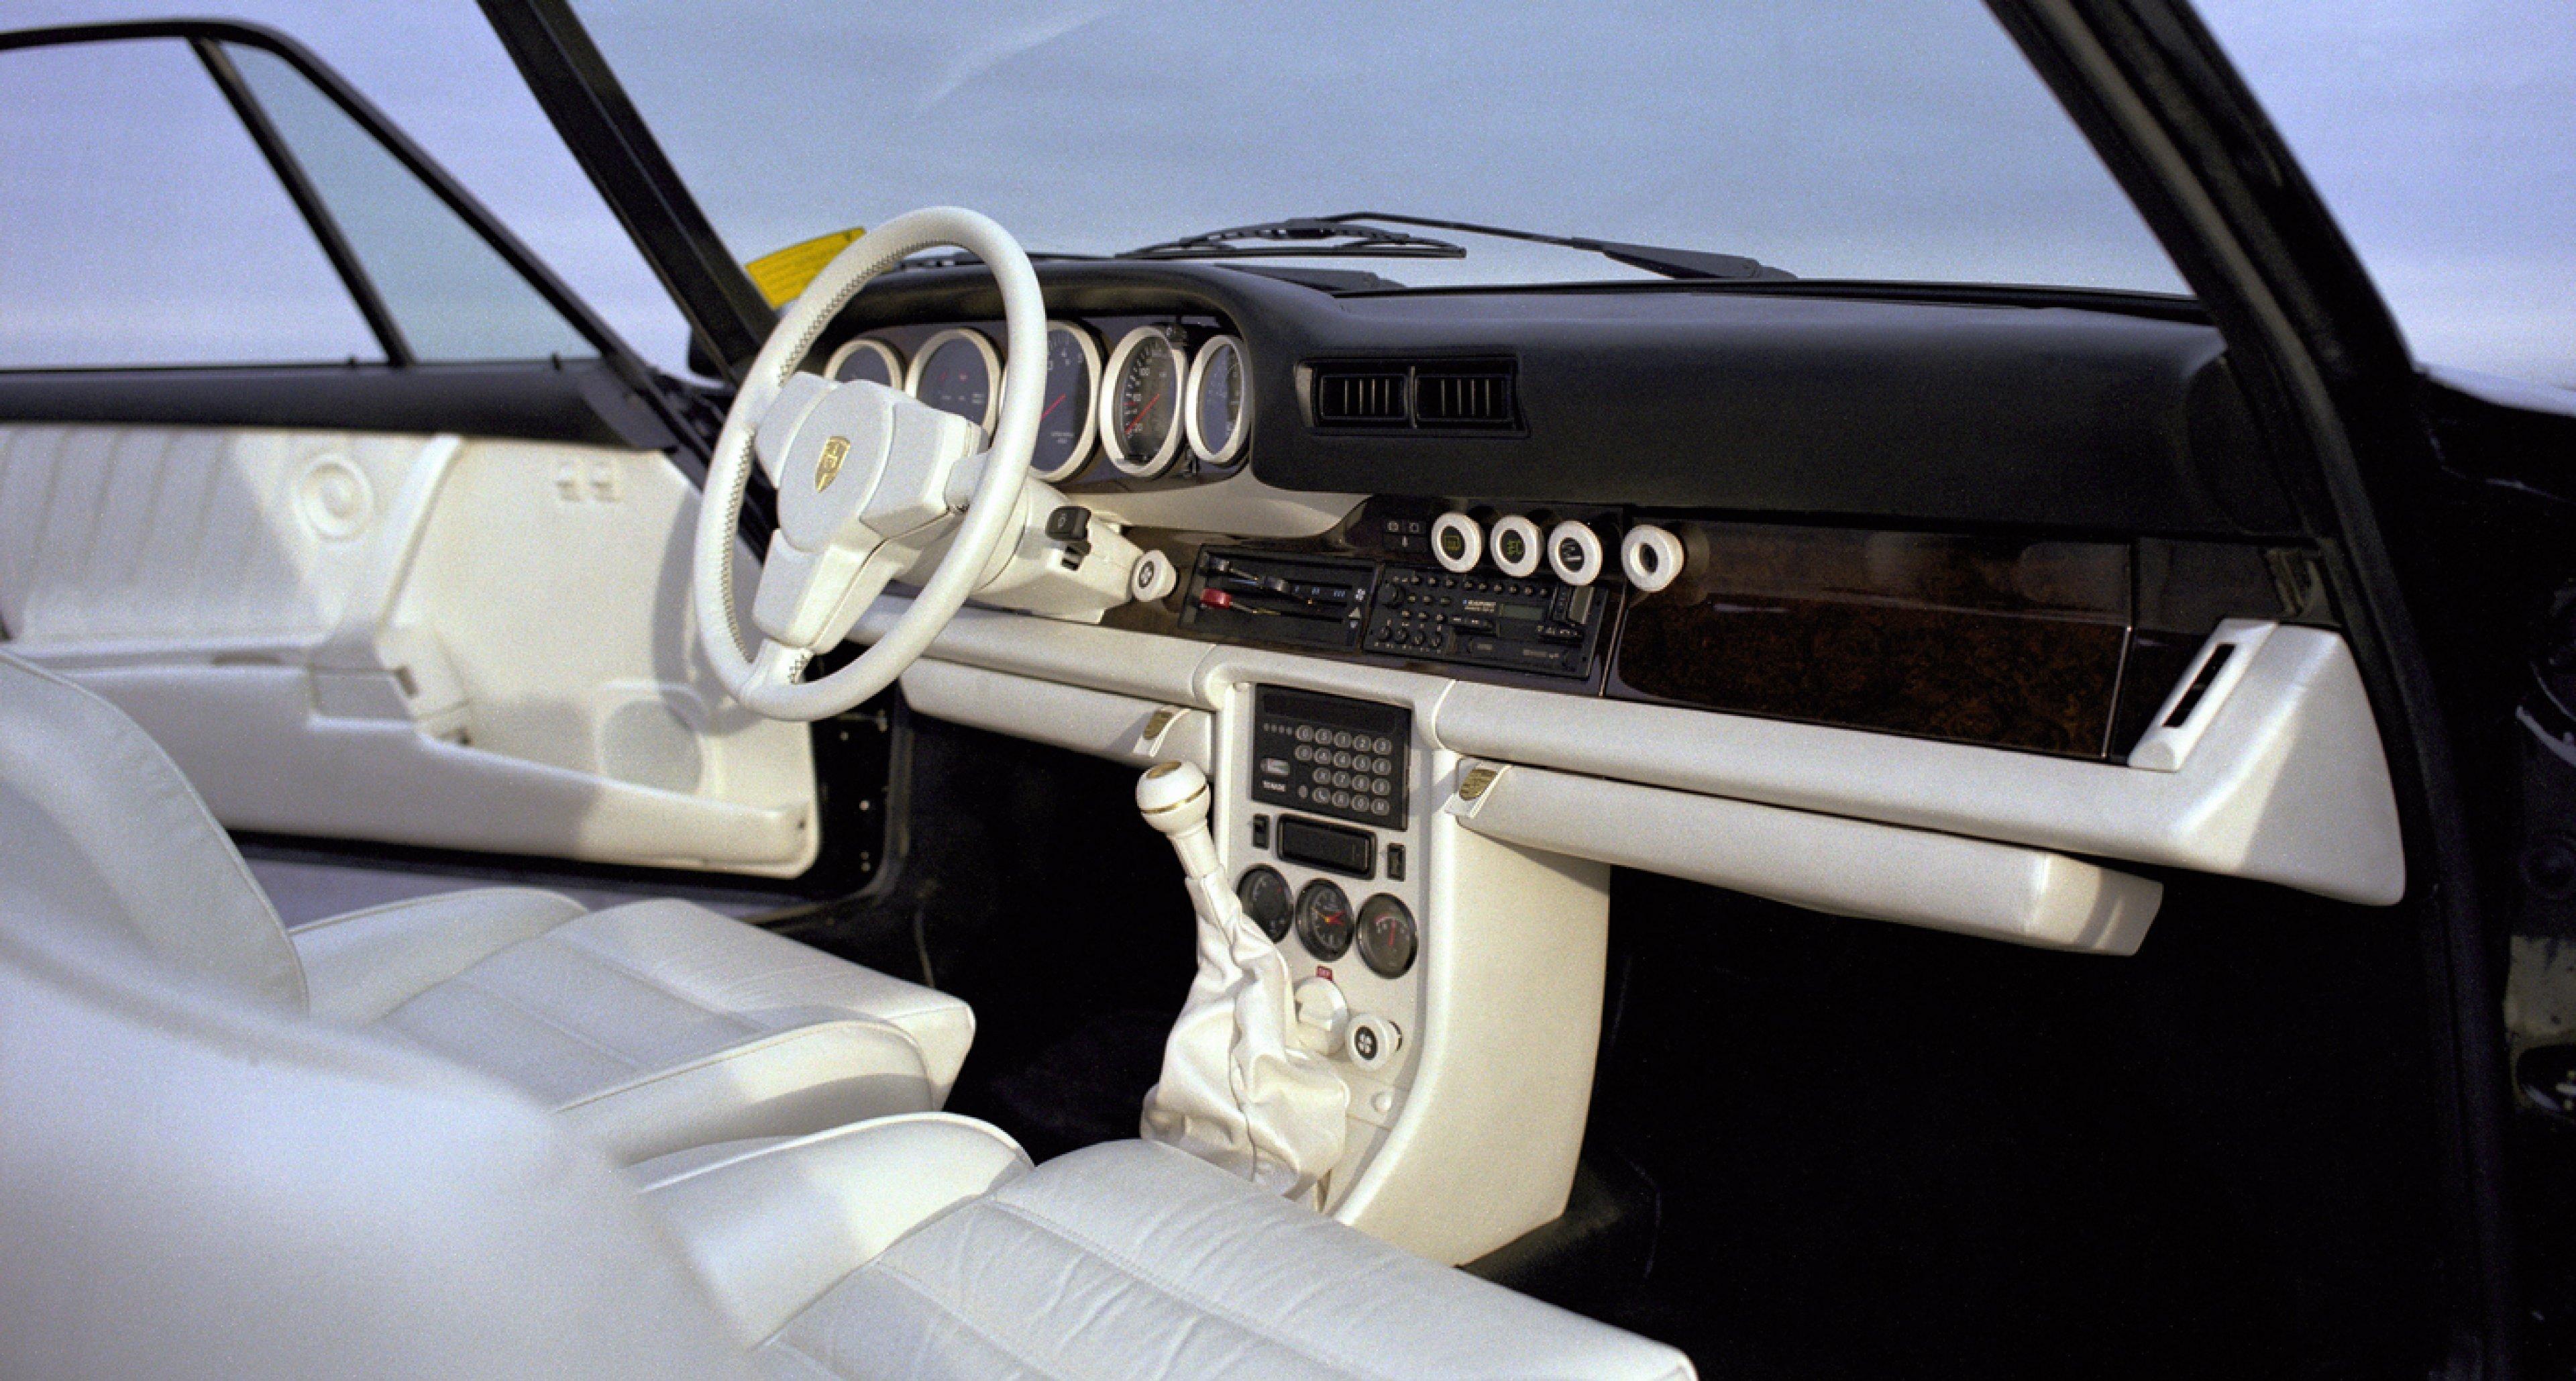 A 1983 Porsche 911 Turbo 3,3 with interior by 'Porsche Exclusive'.